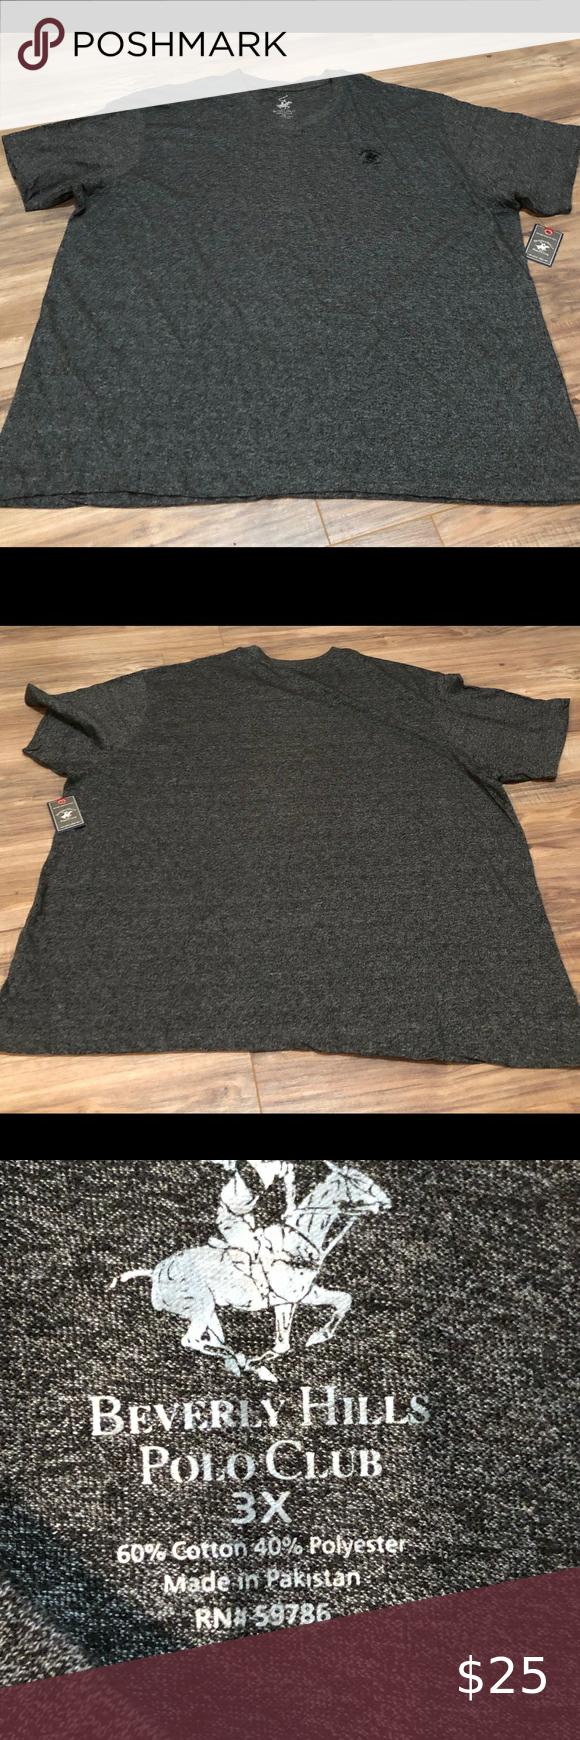 Beverly Hills Polo Club Shirt Gray T Shirt With Logo On Front Beverly Hills Polo Club Shirts Tees Short Sleeve Beverly Hills Polo Club Club Shirts Polo Club